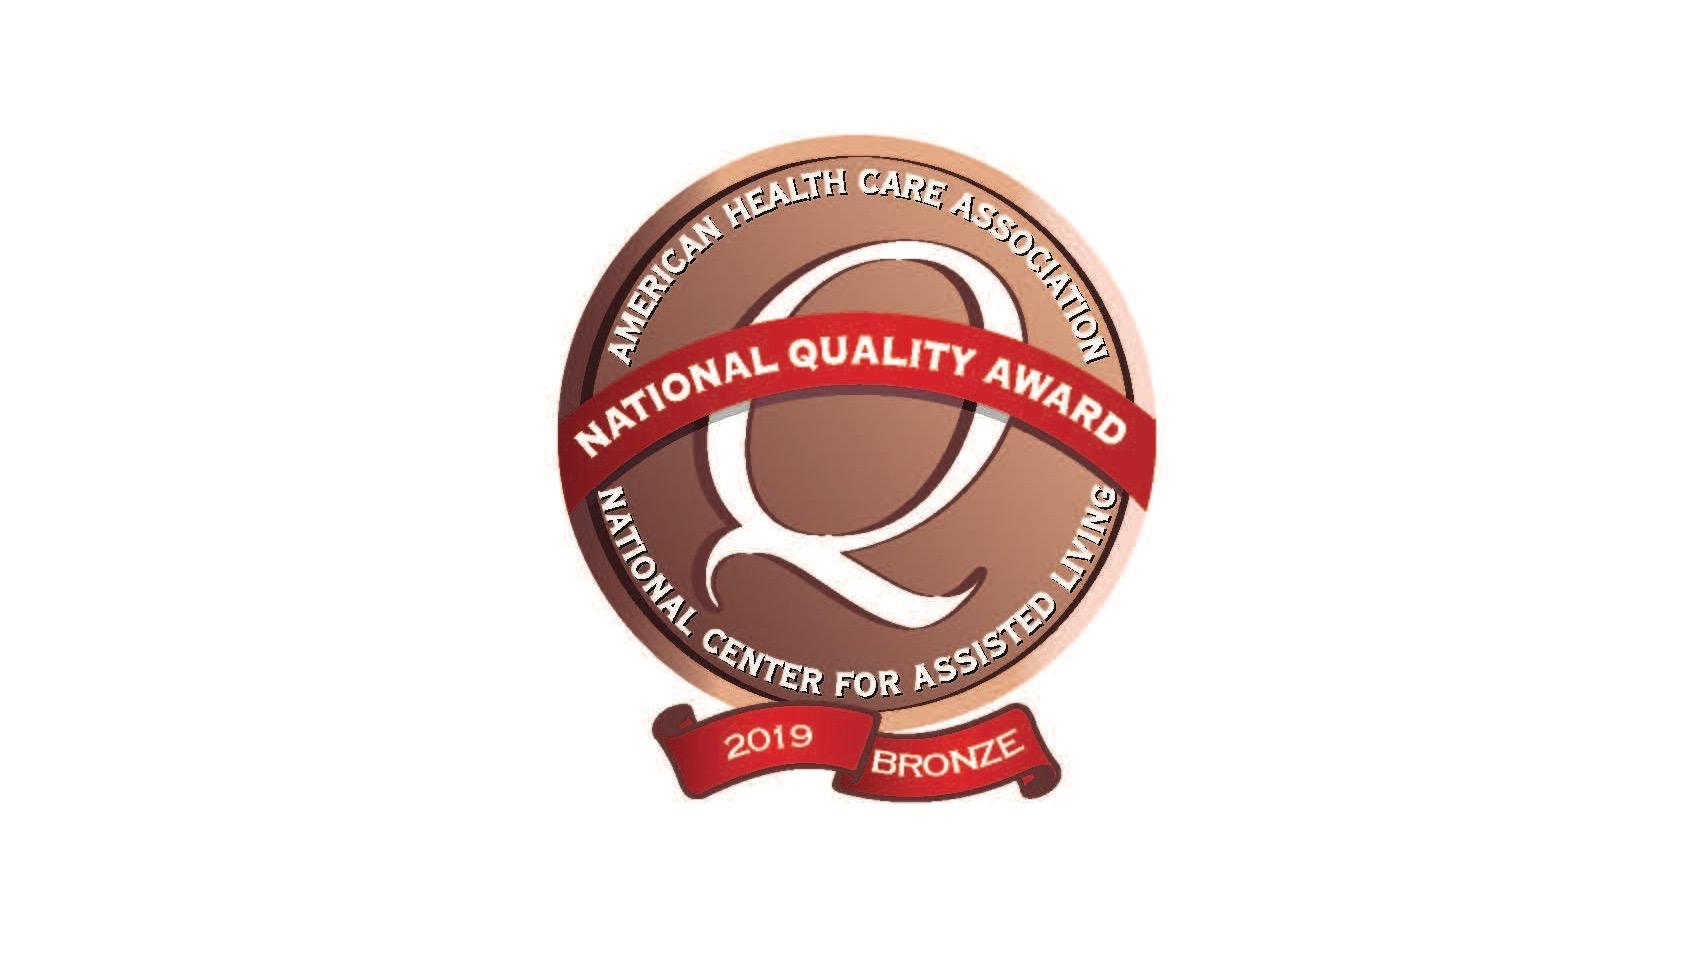 2019 American Health Care Association National Quality Award - Bronze